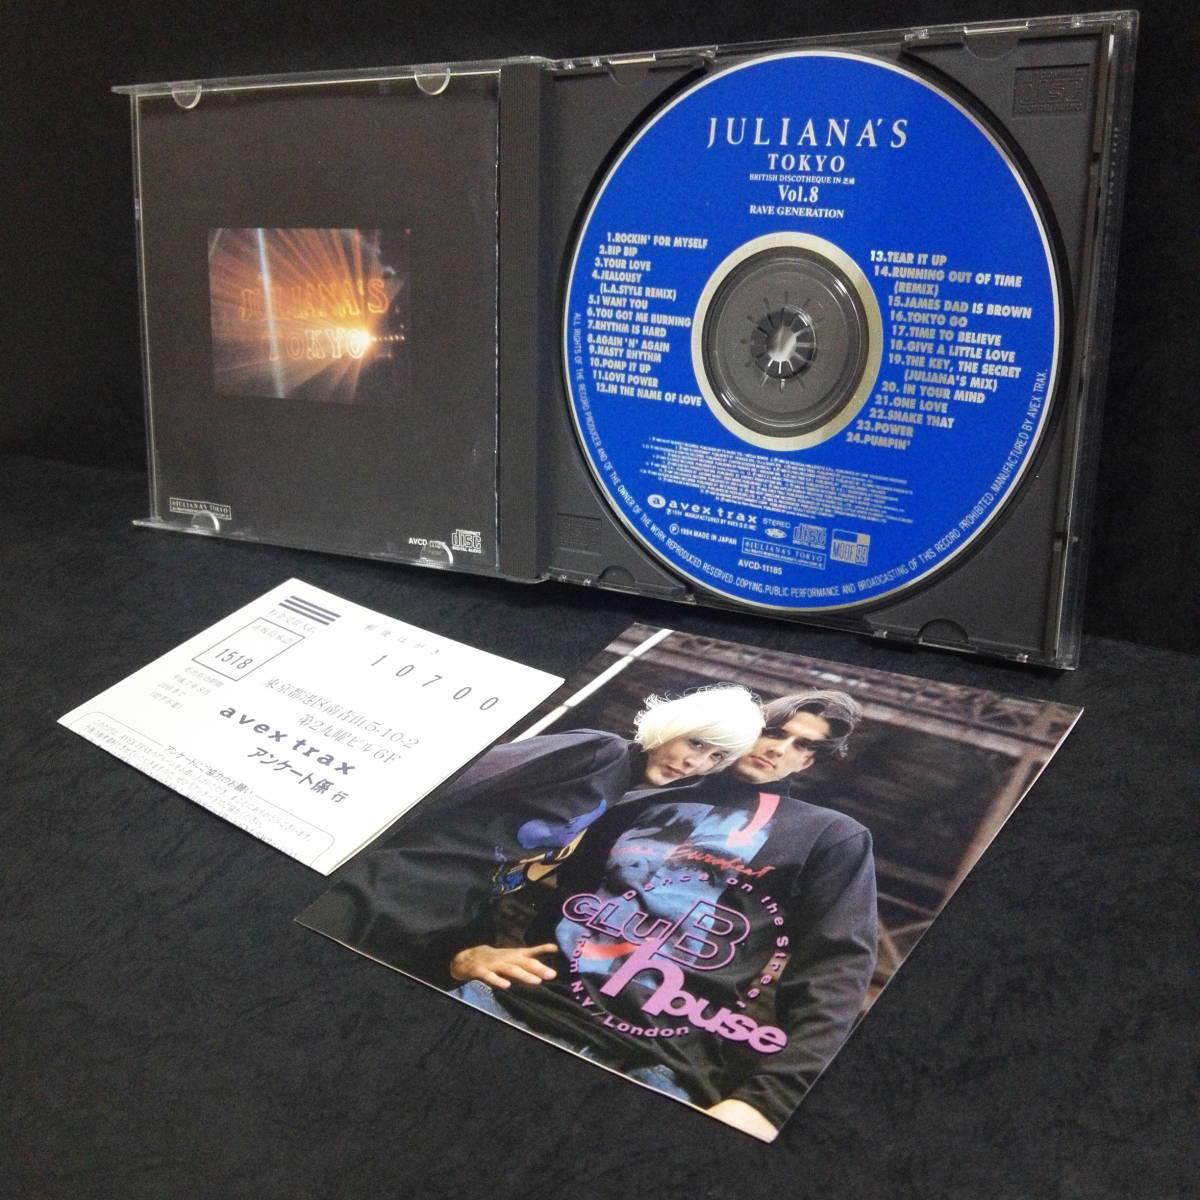 JULIANA'S TOKYO Vol.8 ジュリアナ 東京 90s ディスコ DISCO ジョンロビンソン John Robinson 2ND FUNK-TION L.A.STYLE RAVEMAN Fargetta_画像2